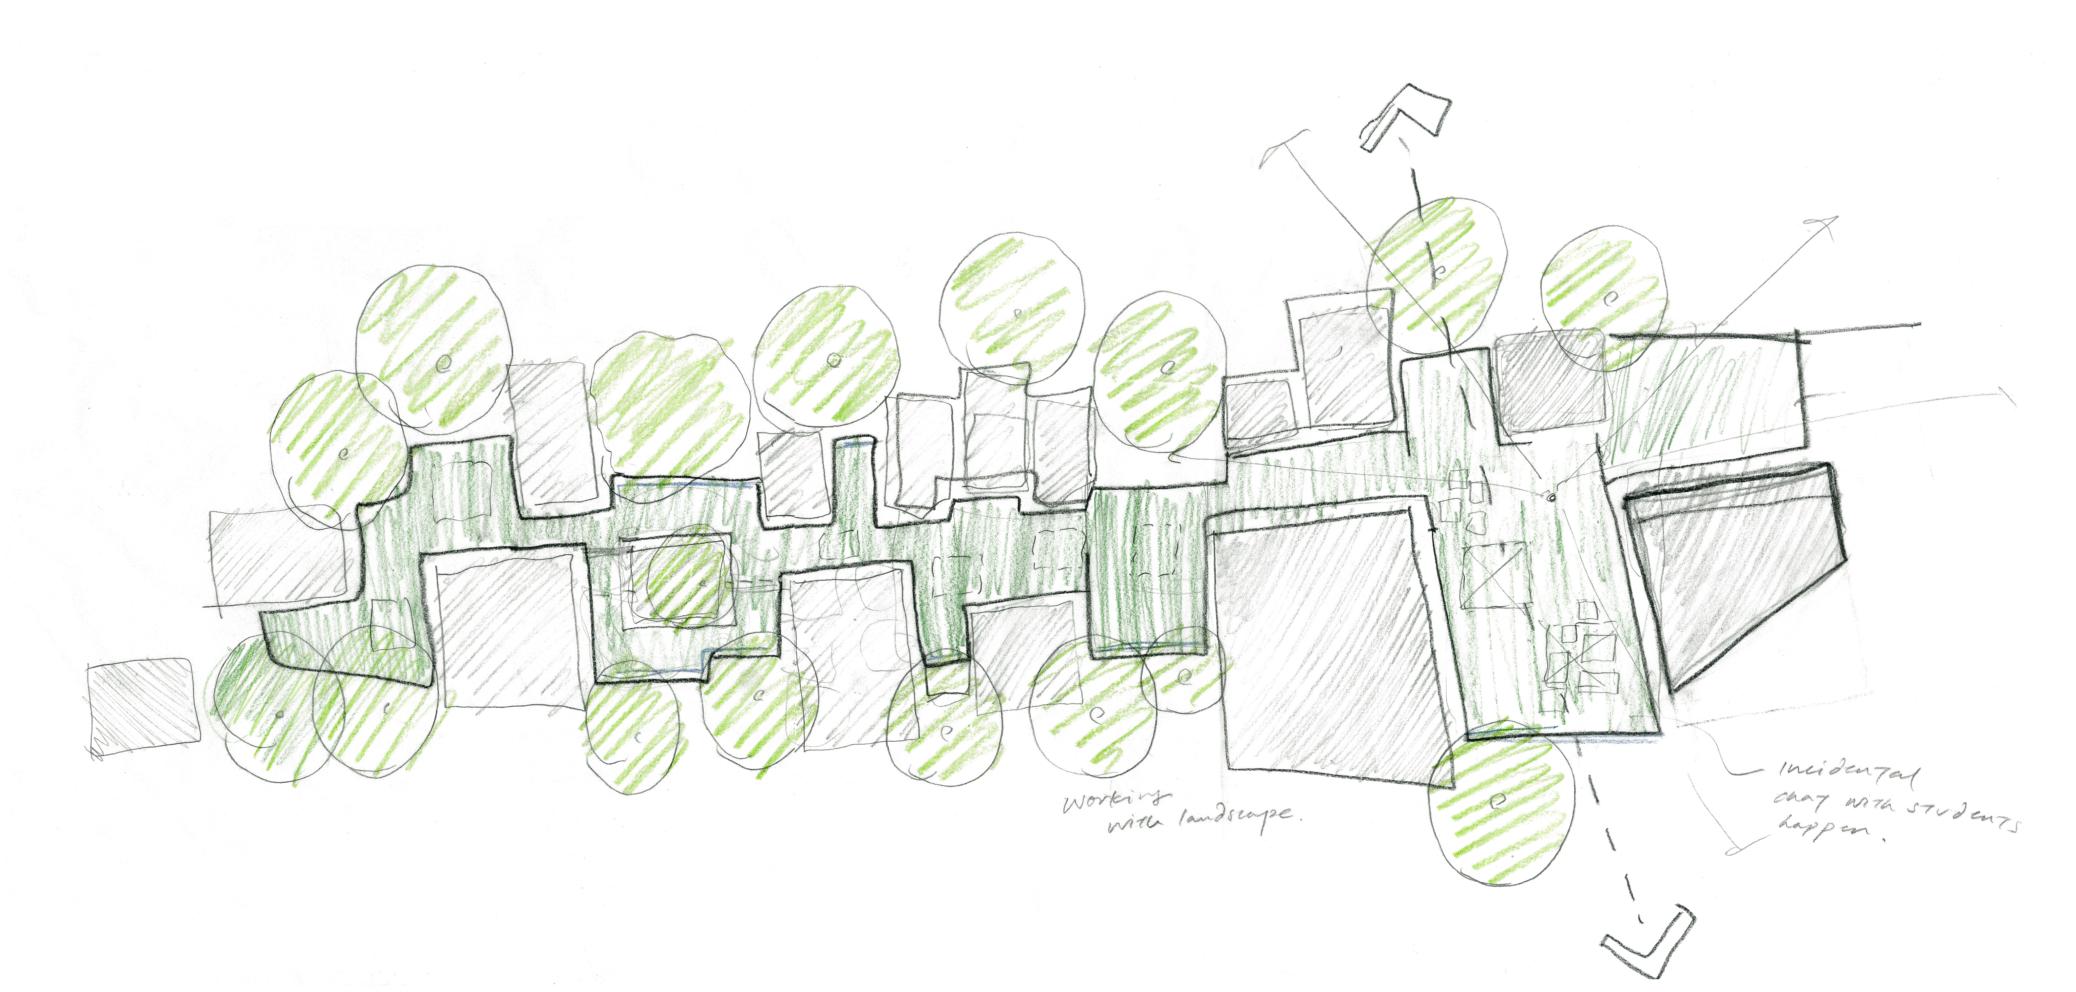 Music School for Stowe School sketch plan 1